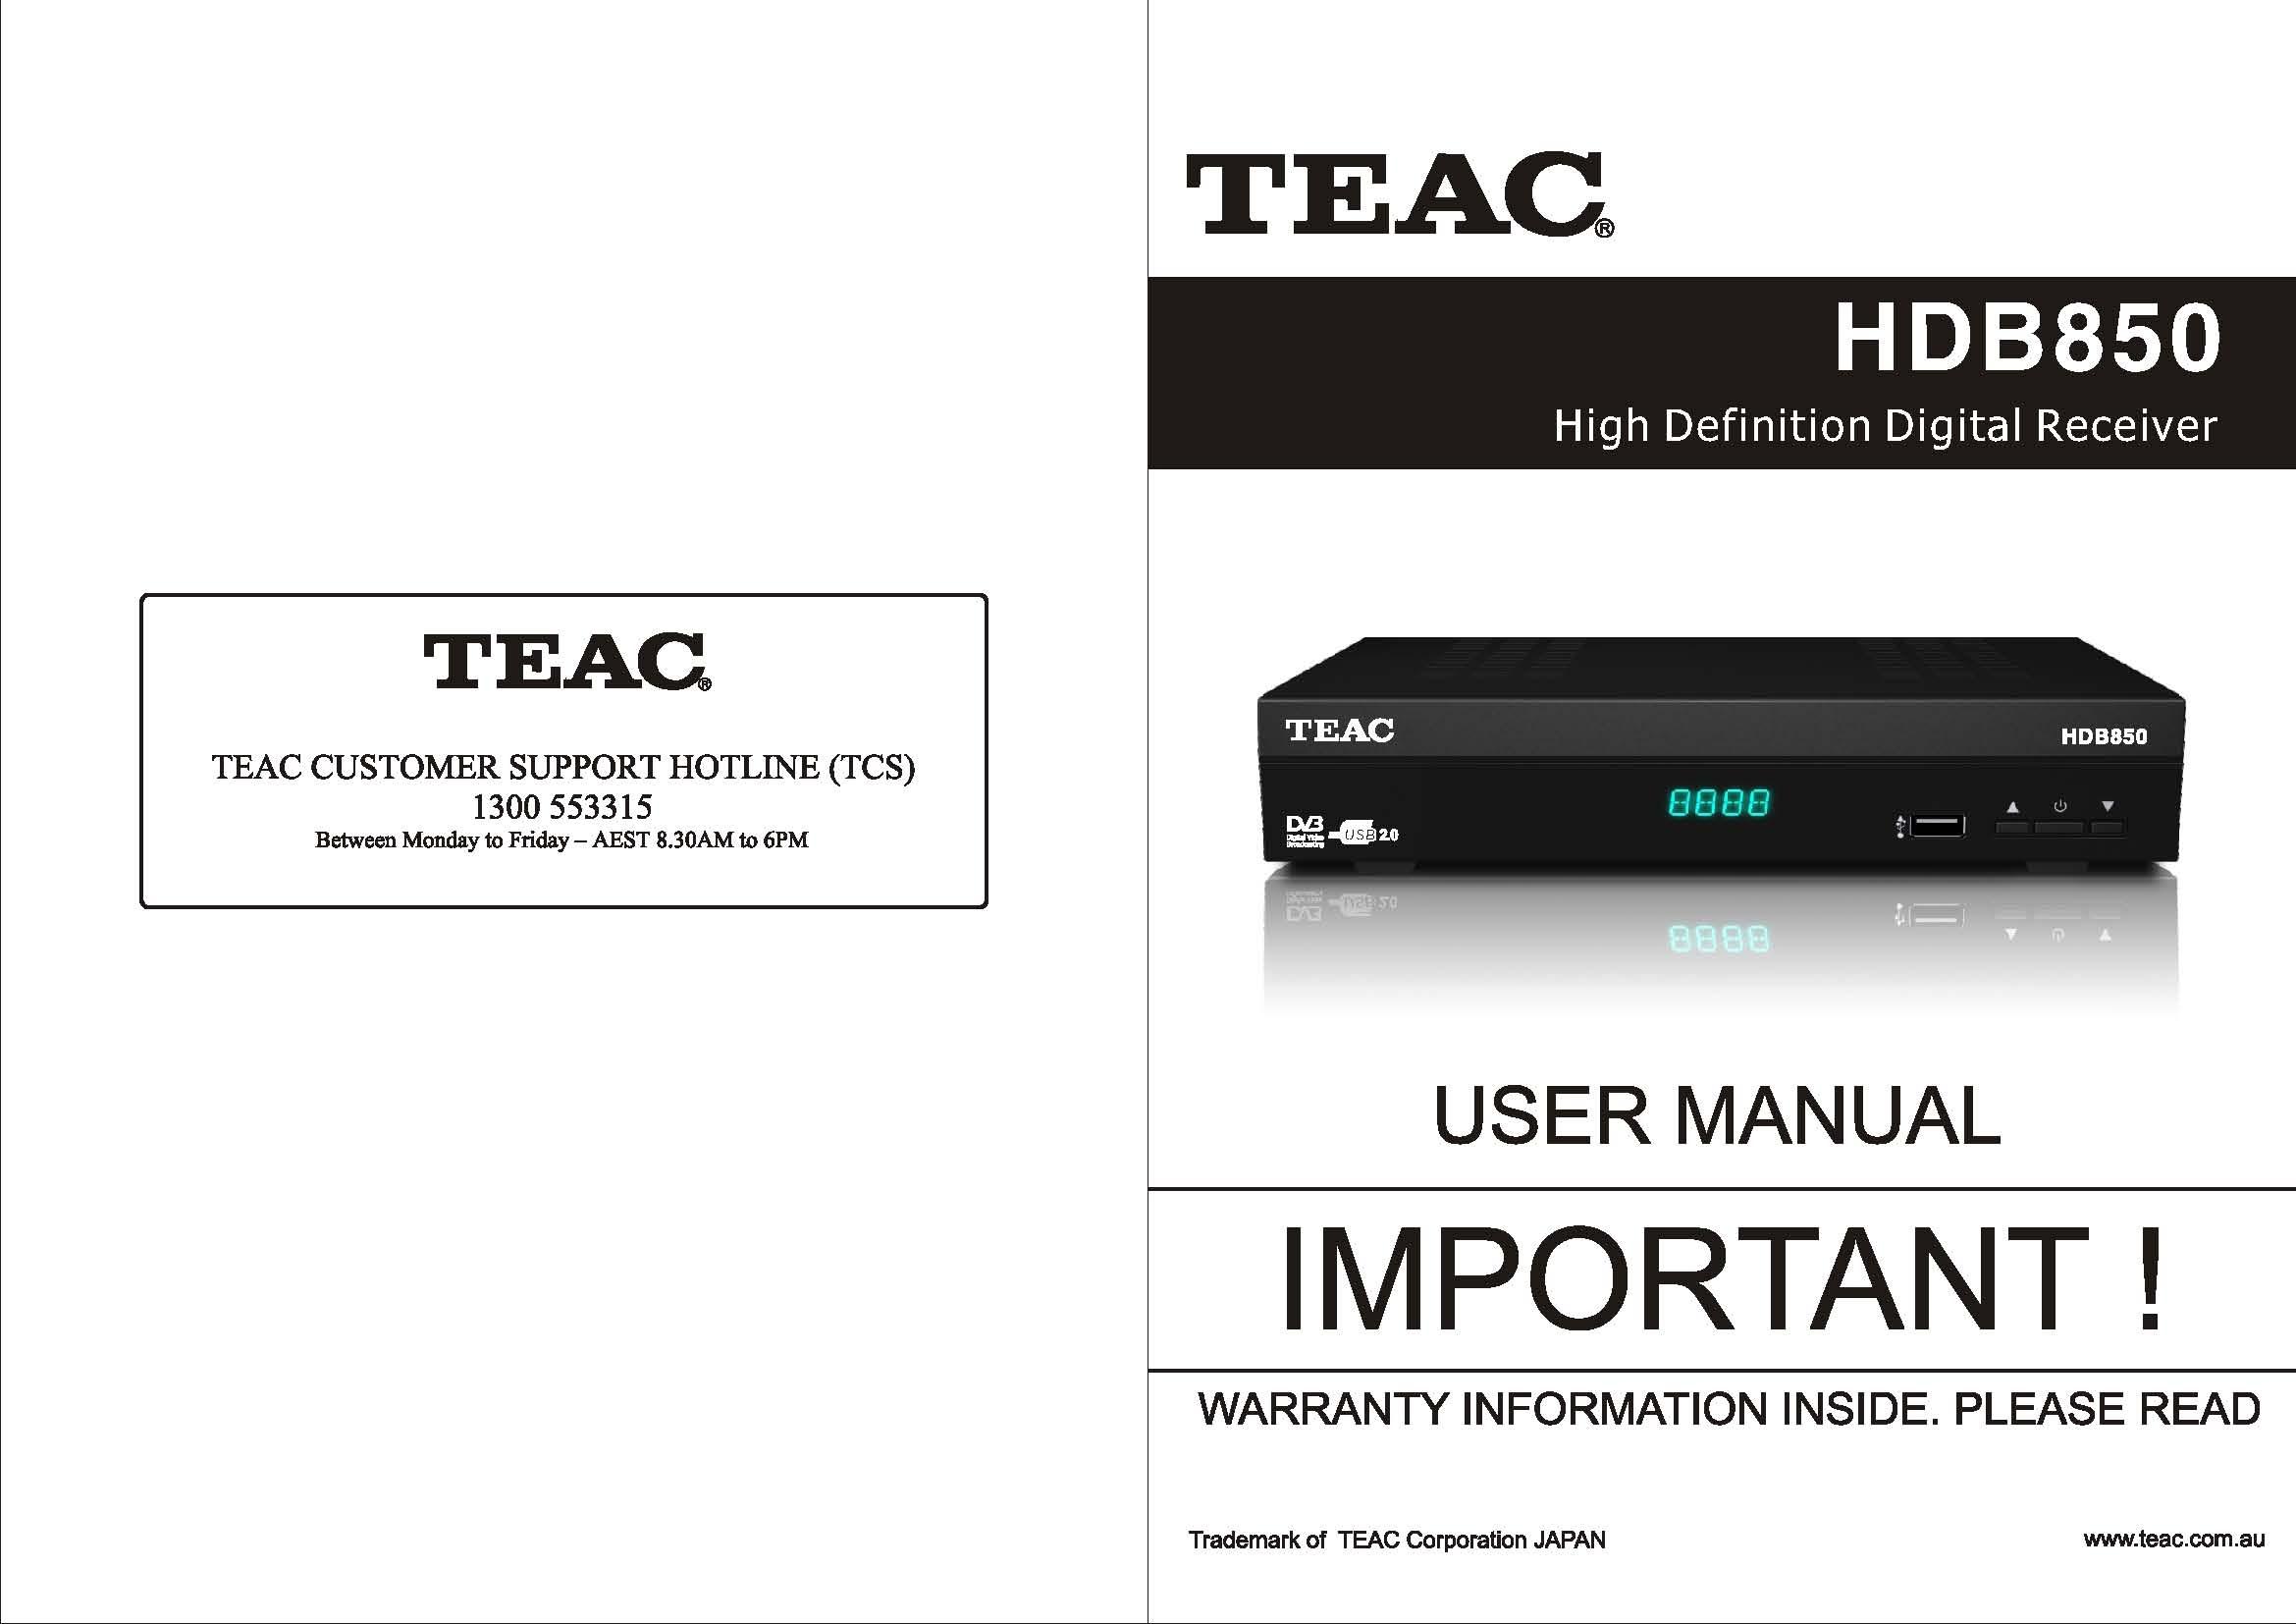 teac hdb850 user manual store809 rh store809 com TEAC 3340 Service Manual teac television user manual